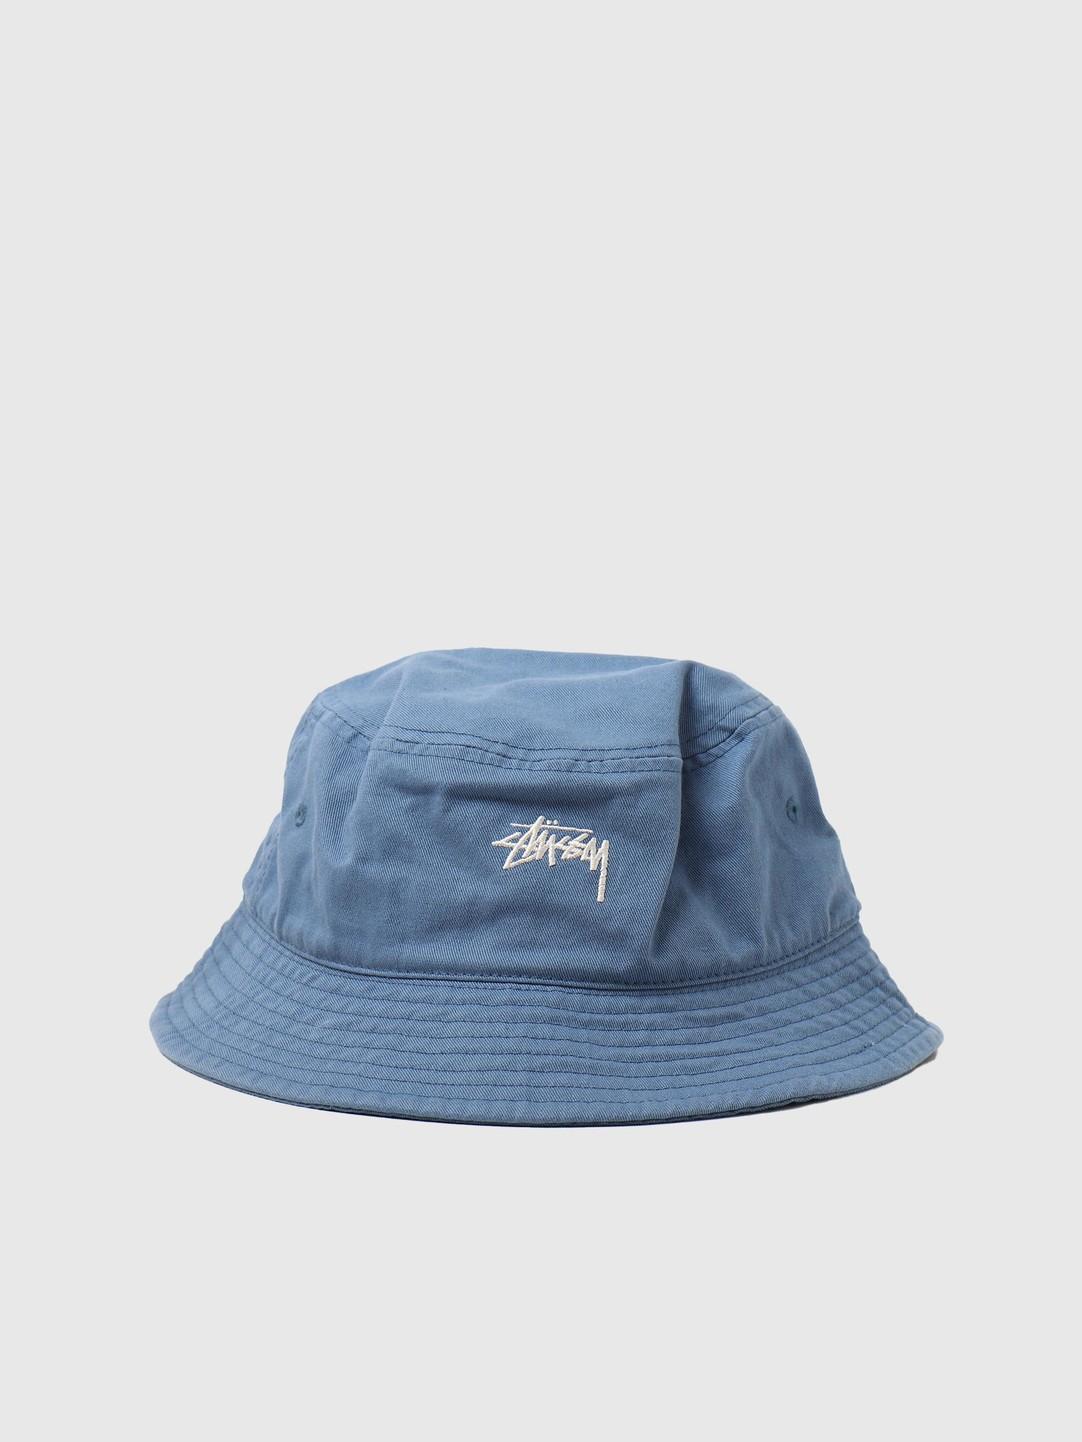 Stussy Stussy Stock Bucket Hat Blue 1321023-0801